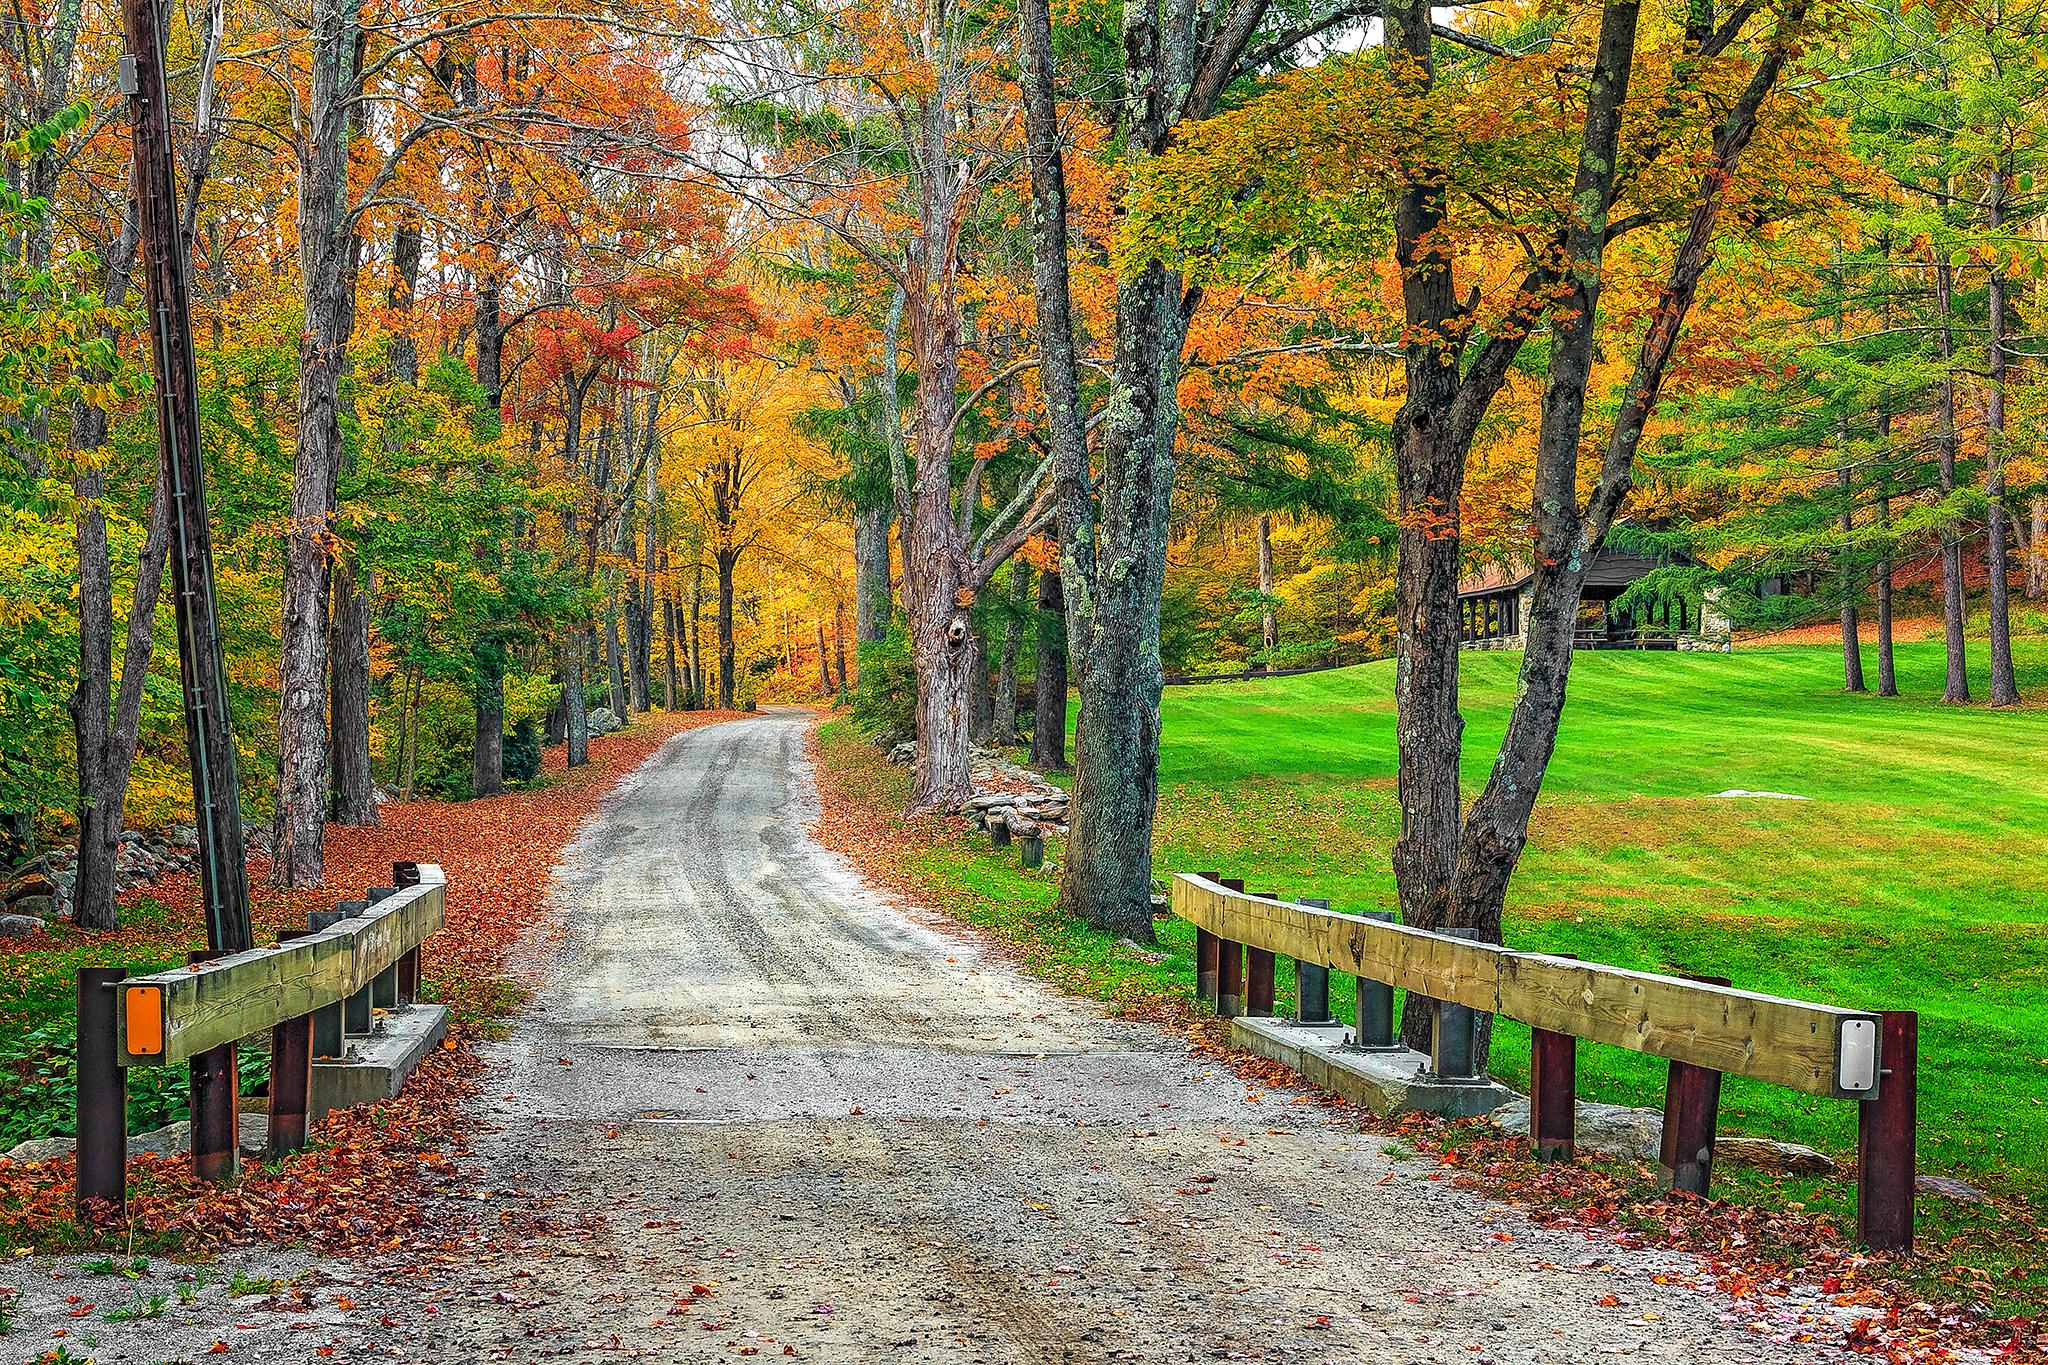 Taken at Macedonia State Park in Kent, Connecticut, USA.